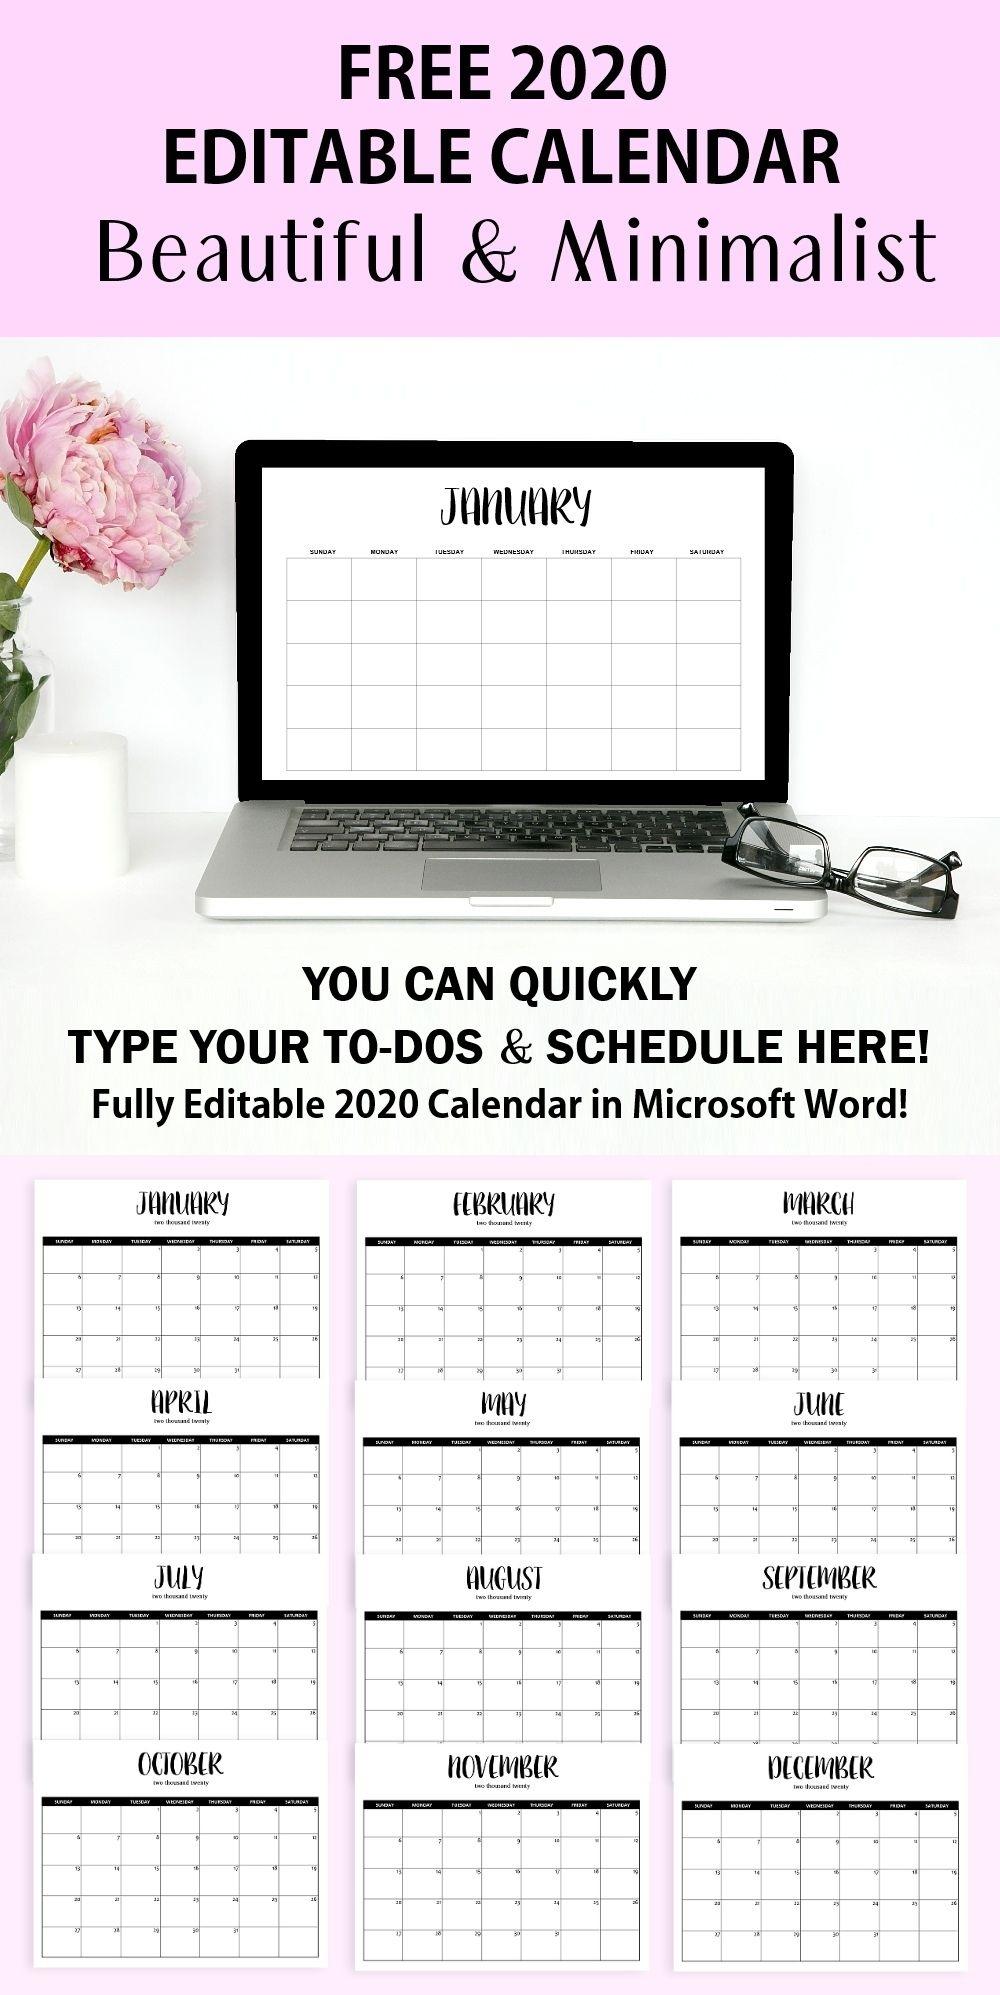 Free Fully Editable 2020 Calendar Template In Word